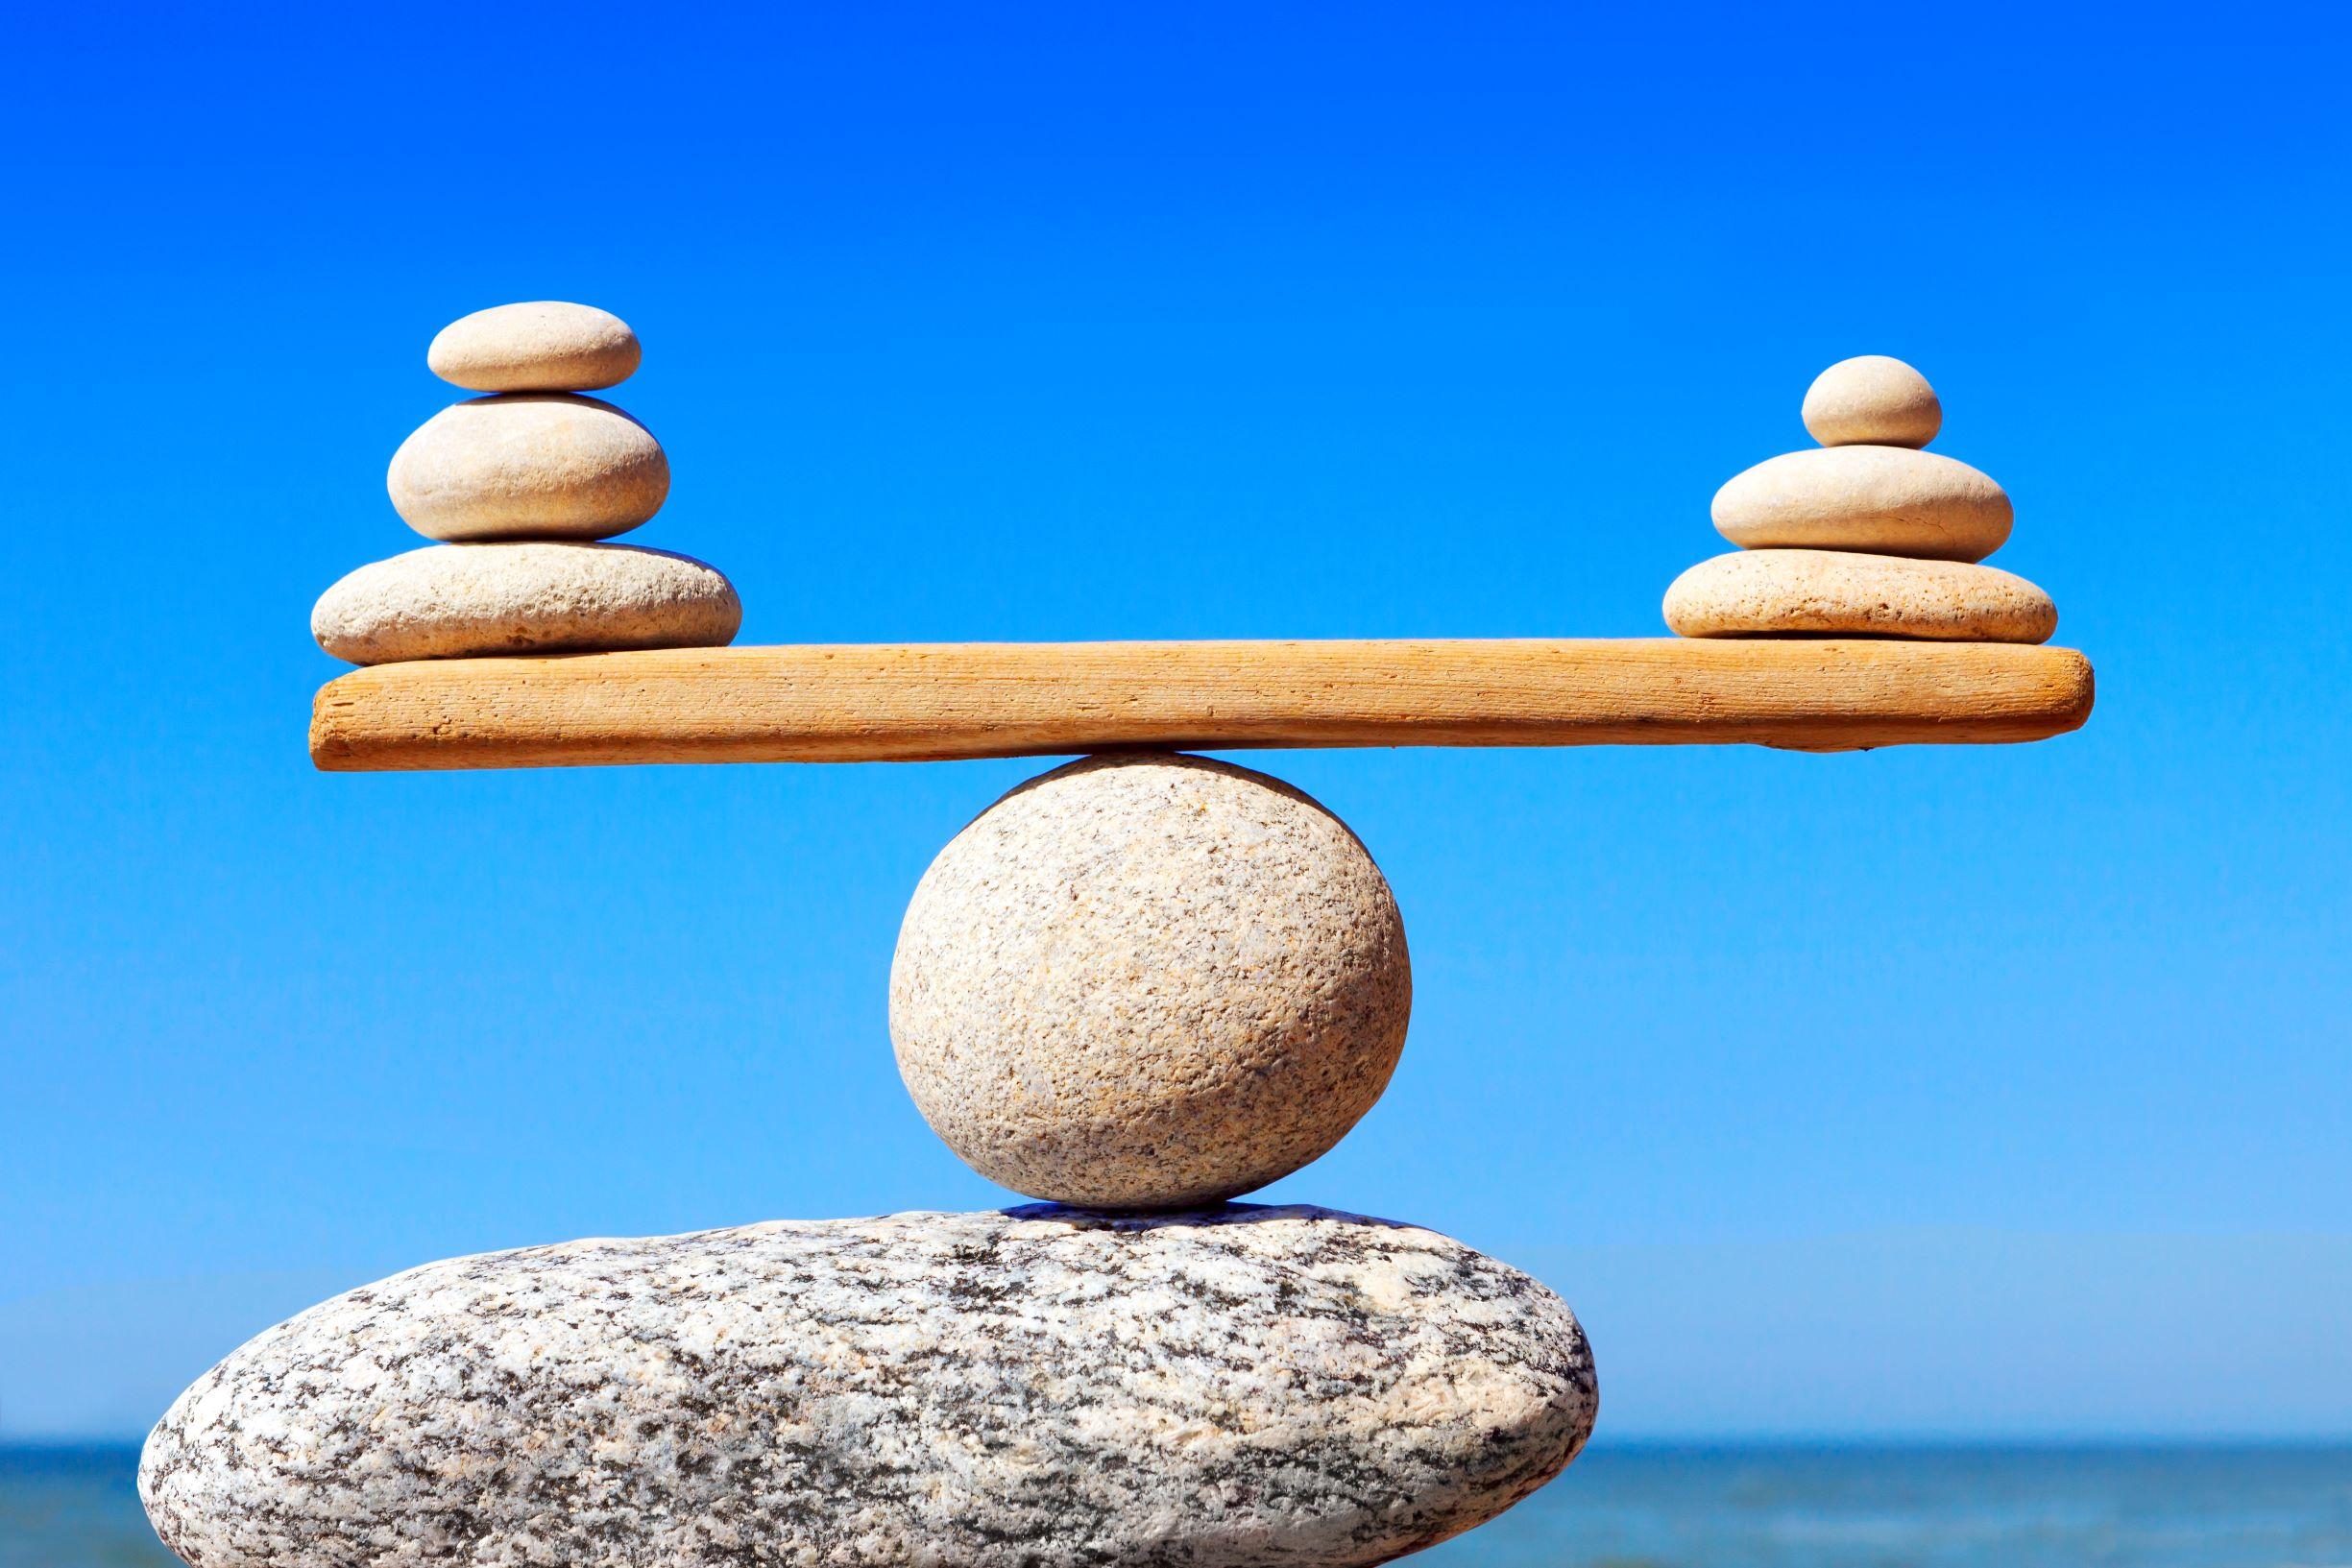 balance, rocks, balancing